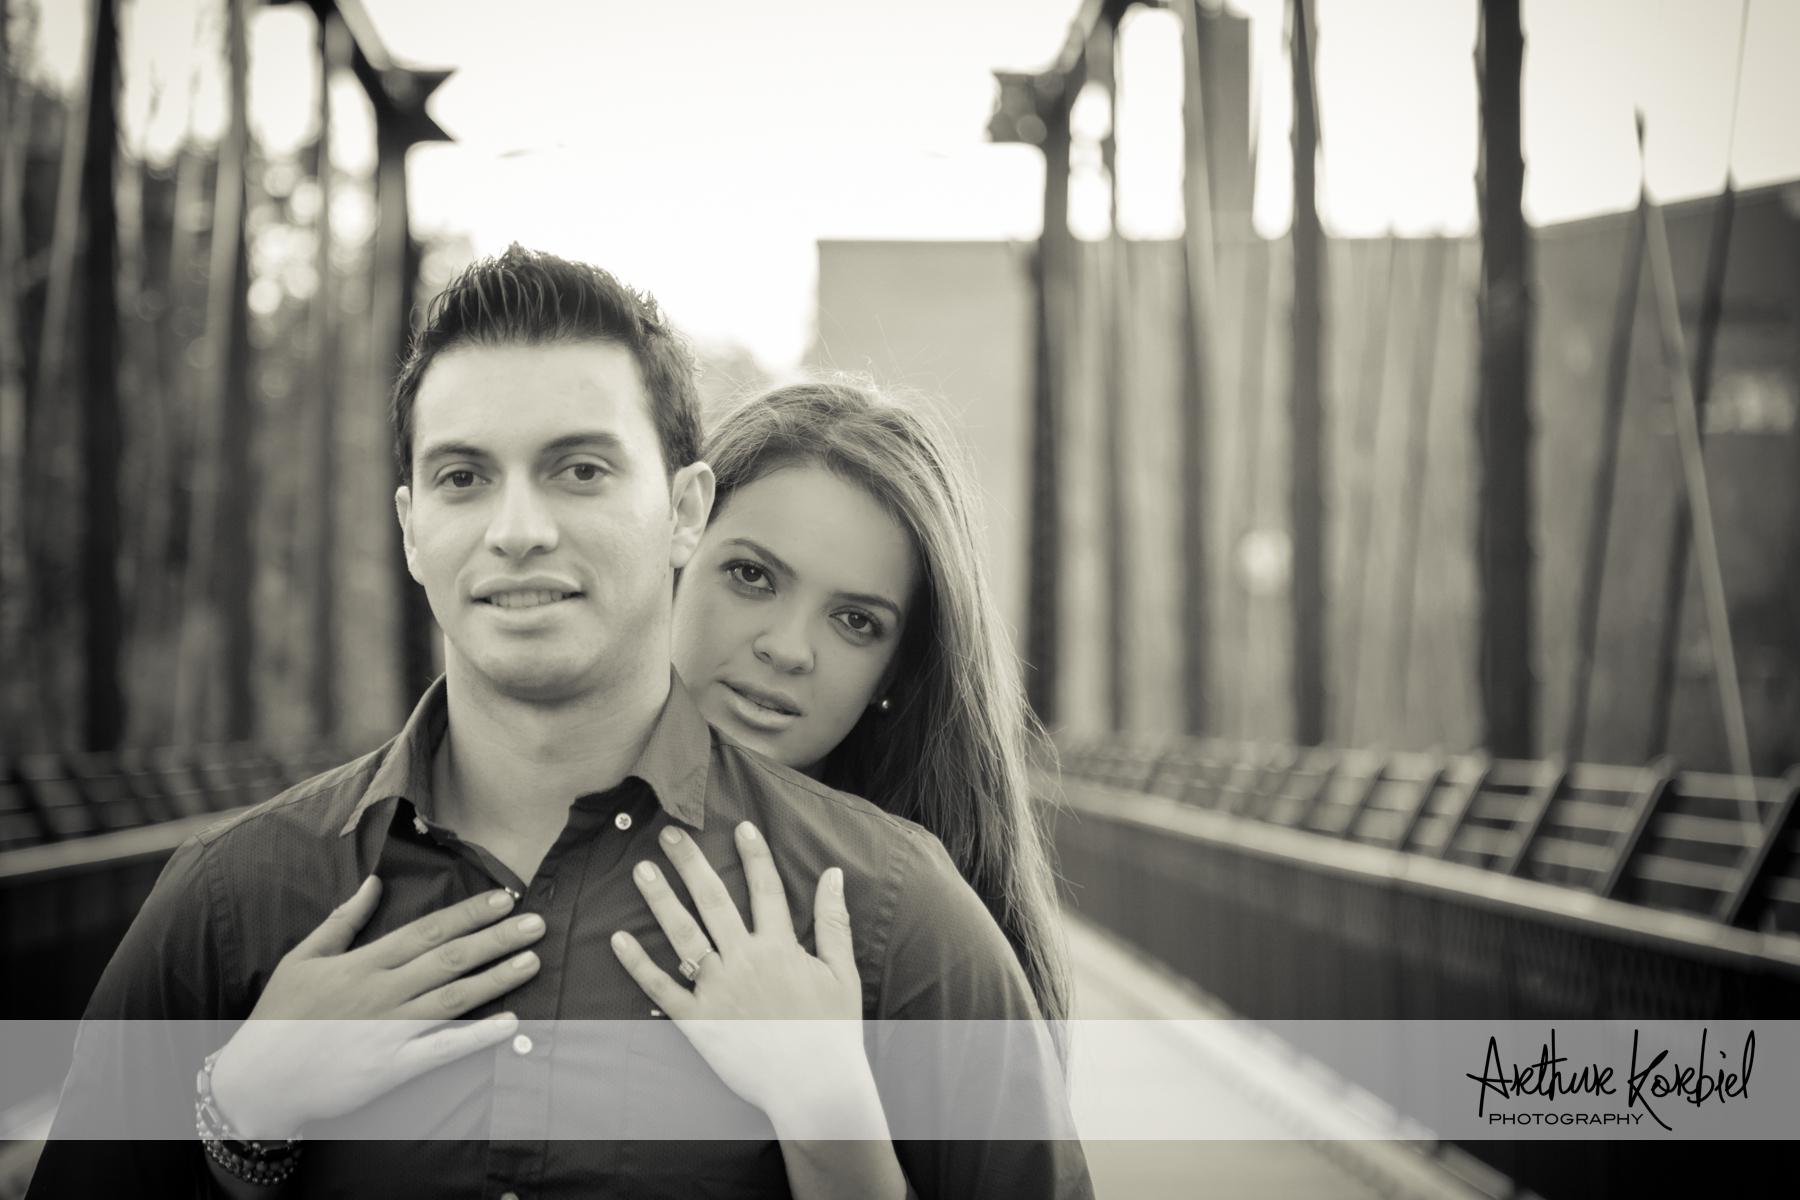 Arthur Korbiel Photography - London Engagement Photographer - Maria & Jose-013.jpg